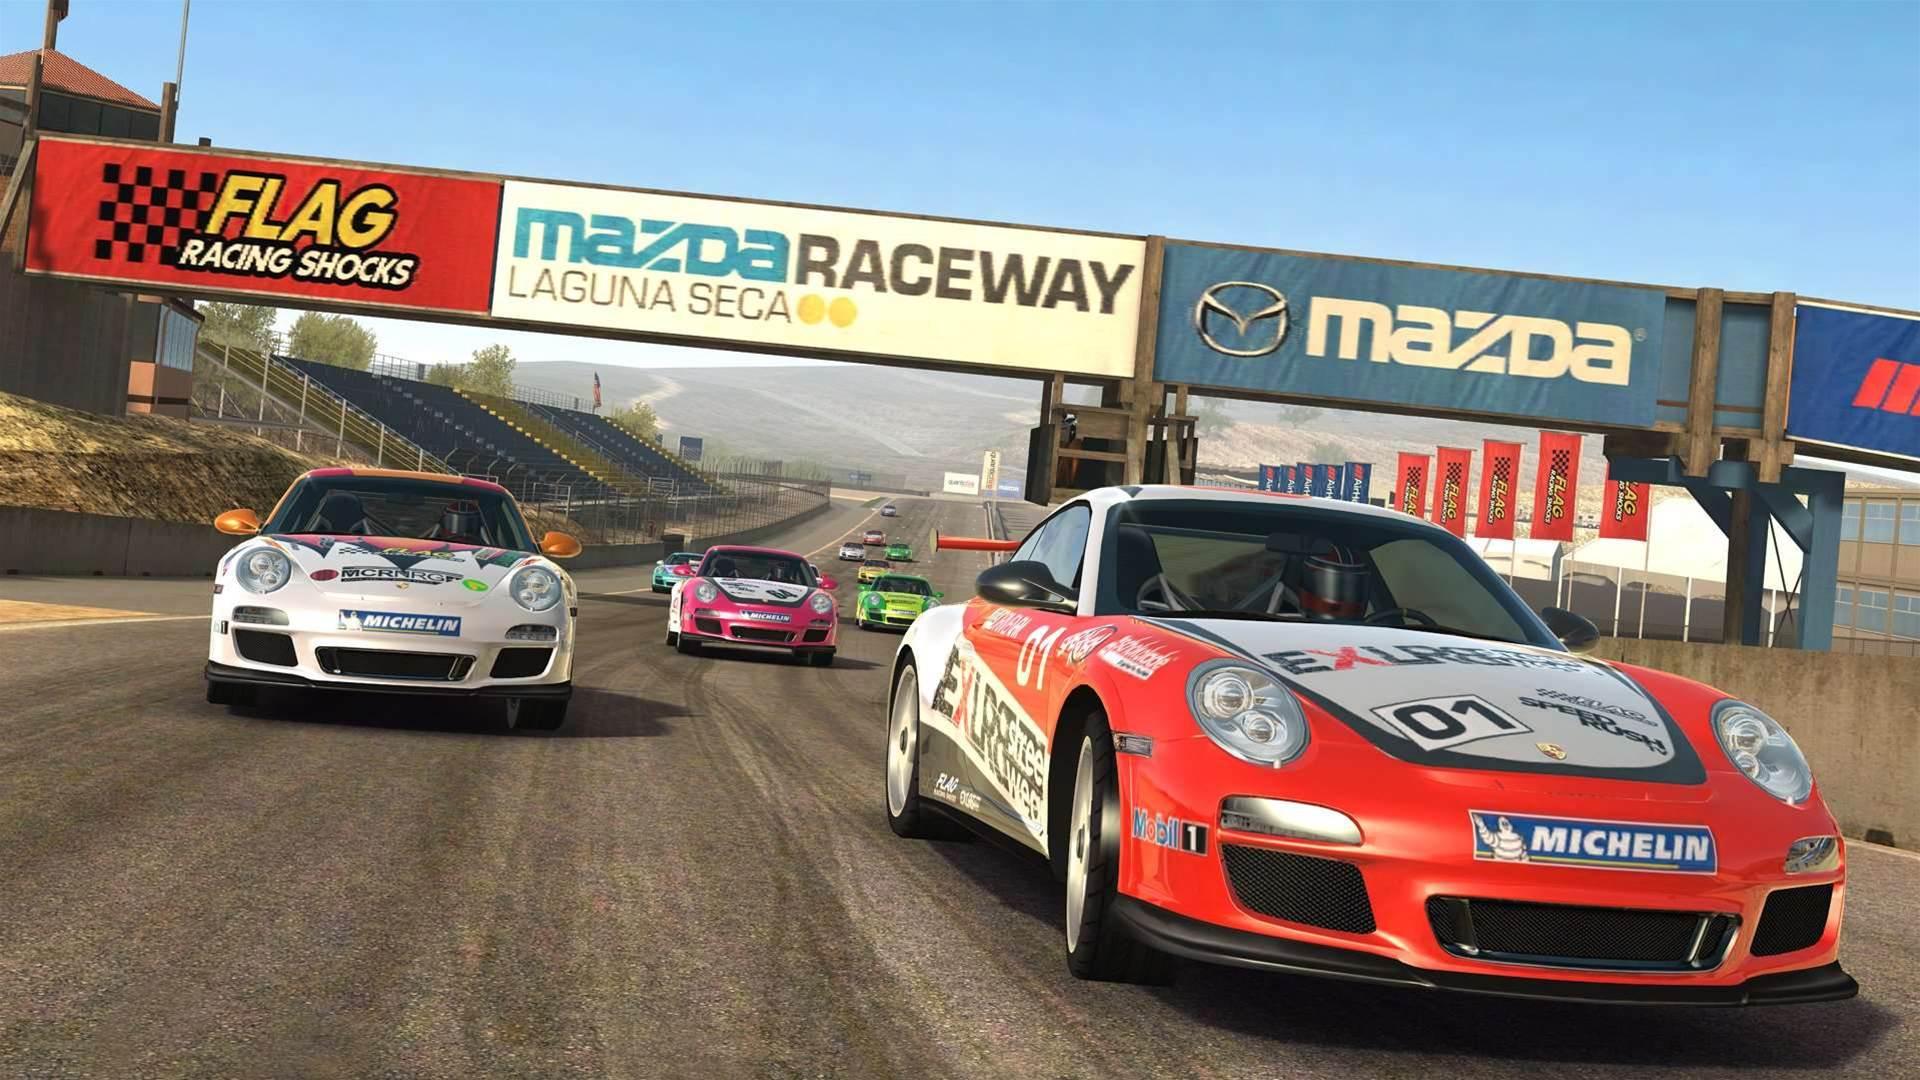 Review: Real Racing 3